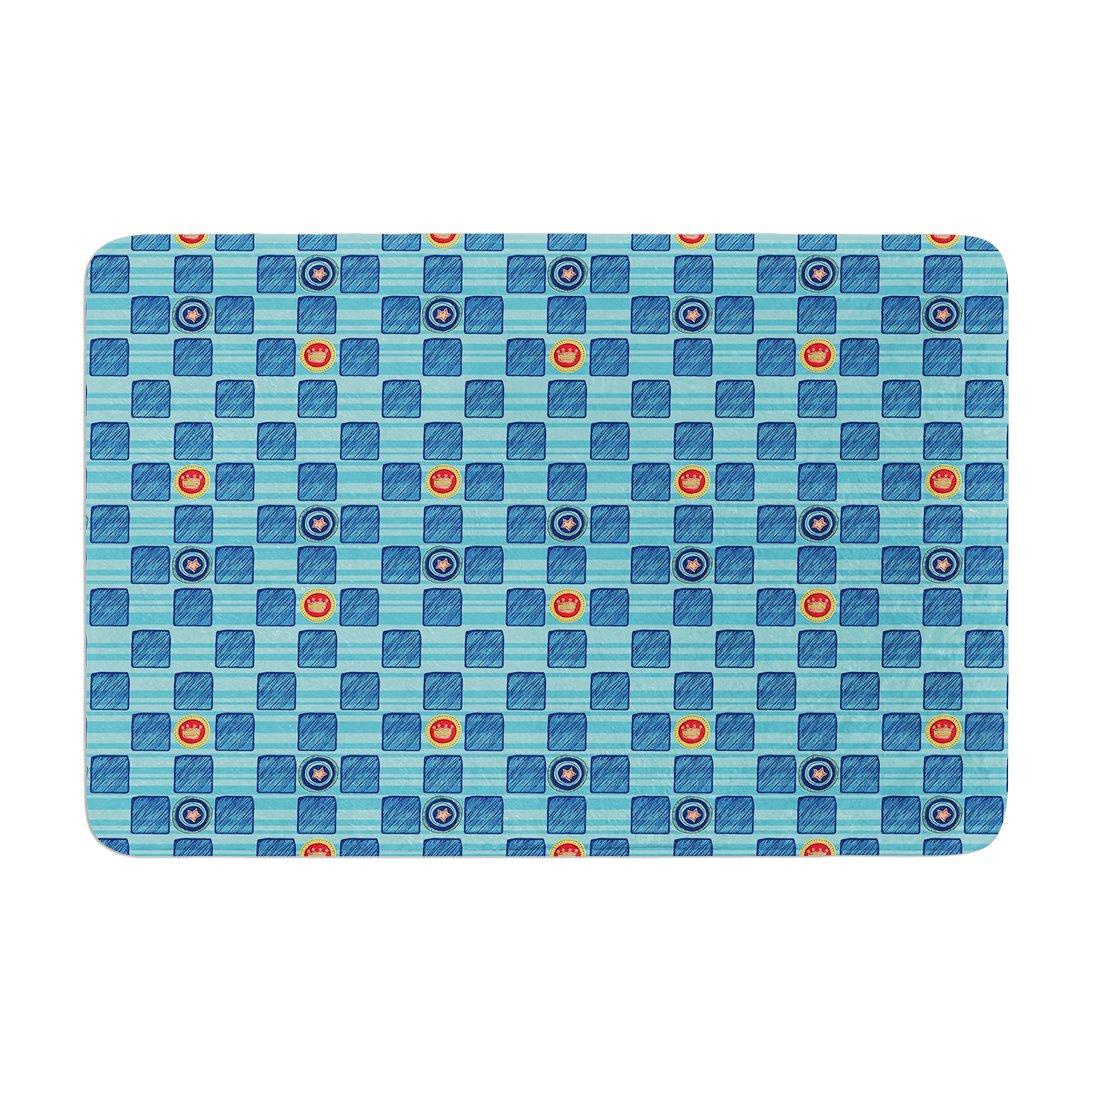 17 by 24 Kess InHouse Jane Smith Vintage Checkerboard Blue Navy Memory Foam Bath Mat